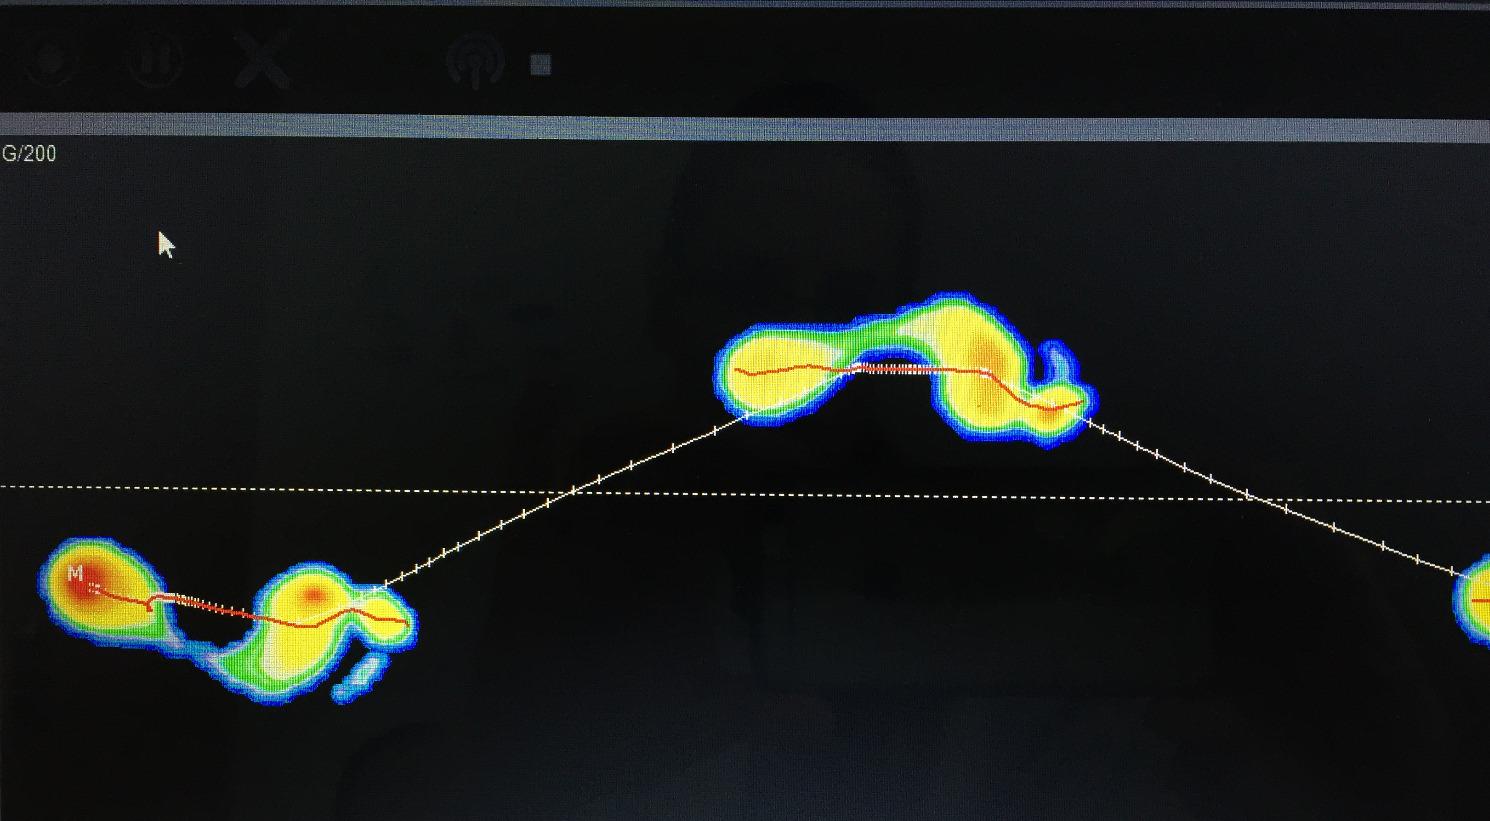 Analyse de la marche